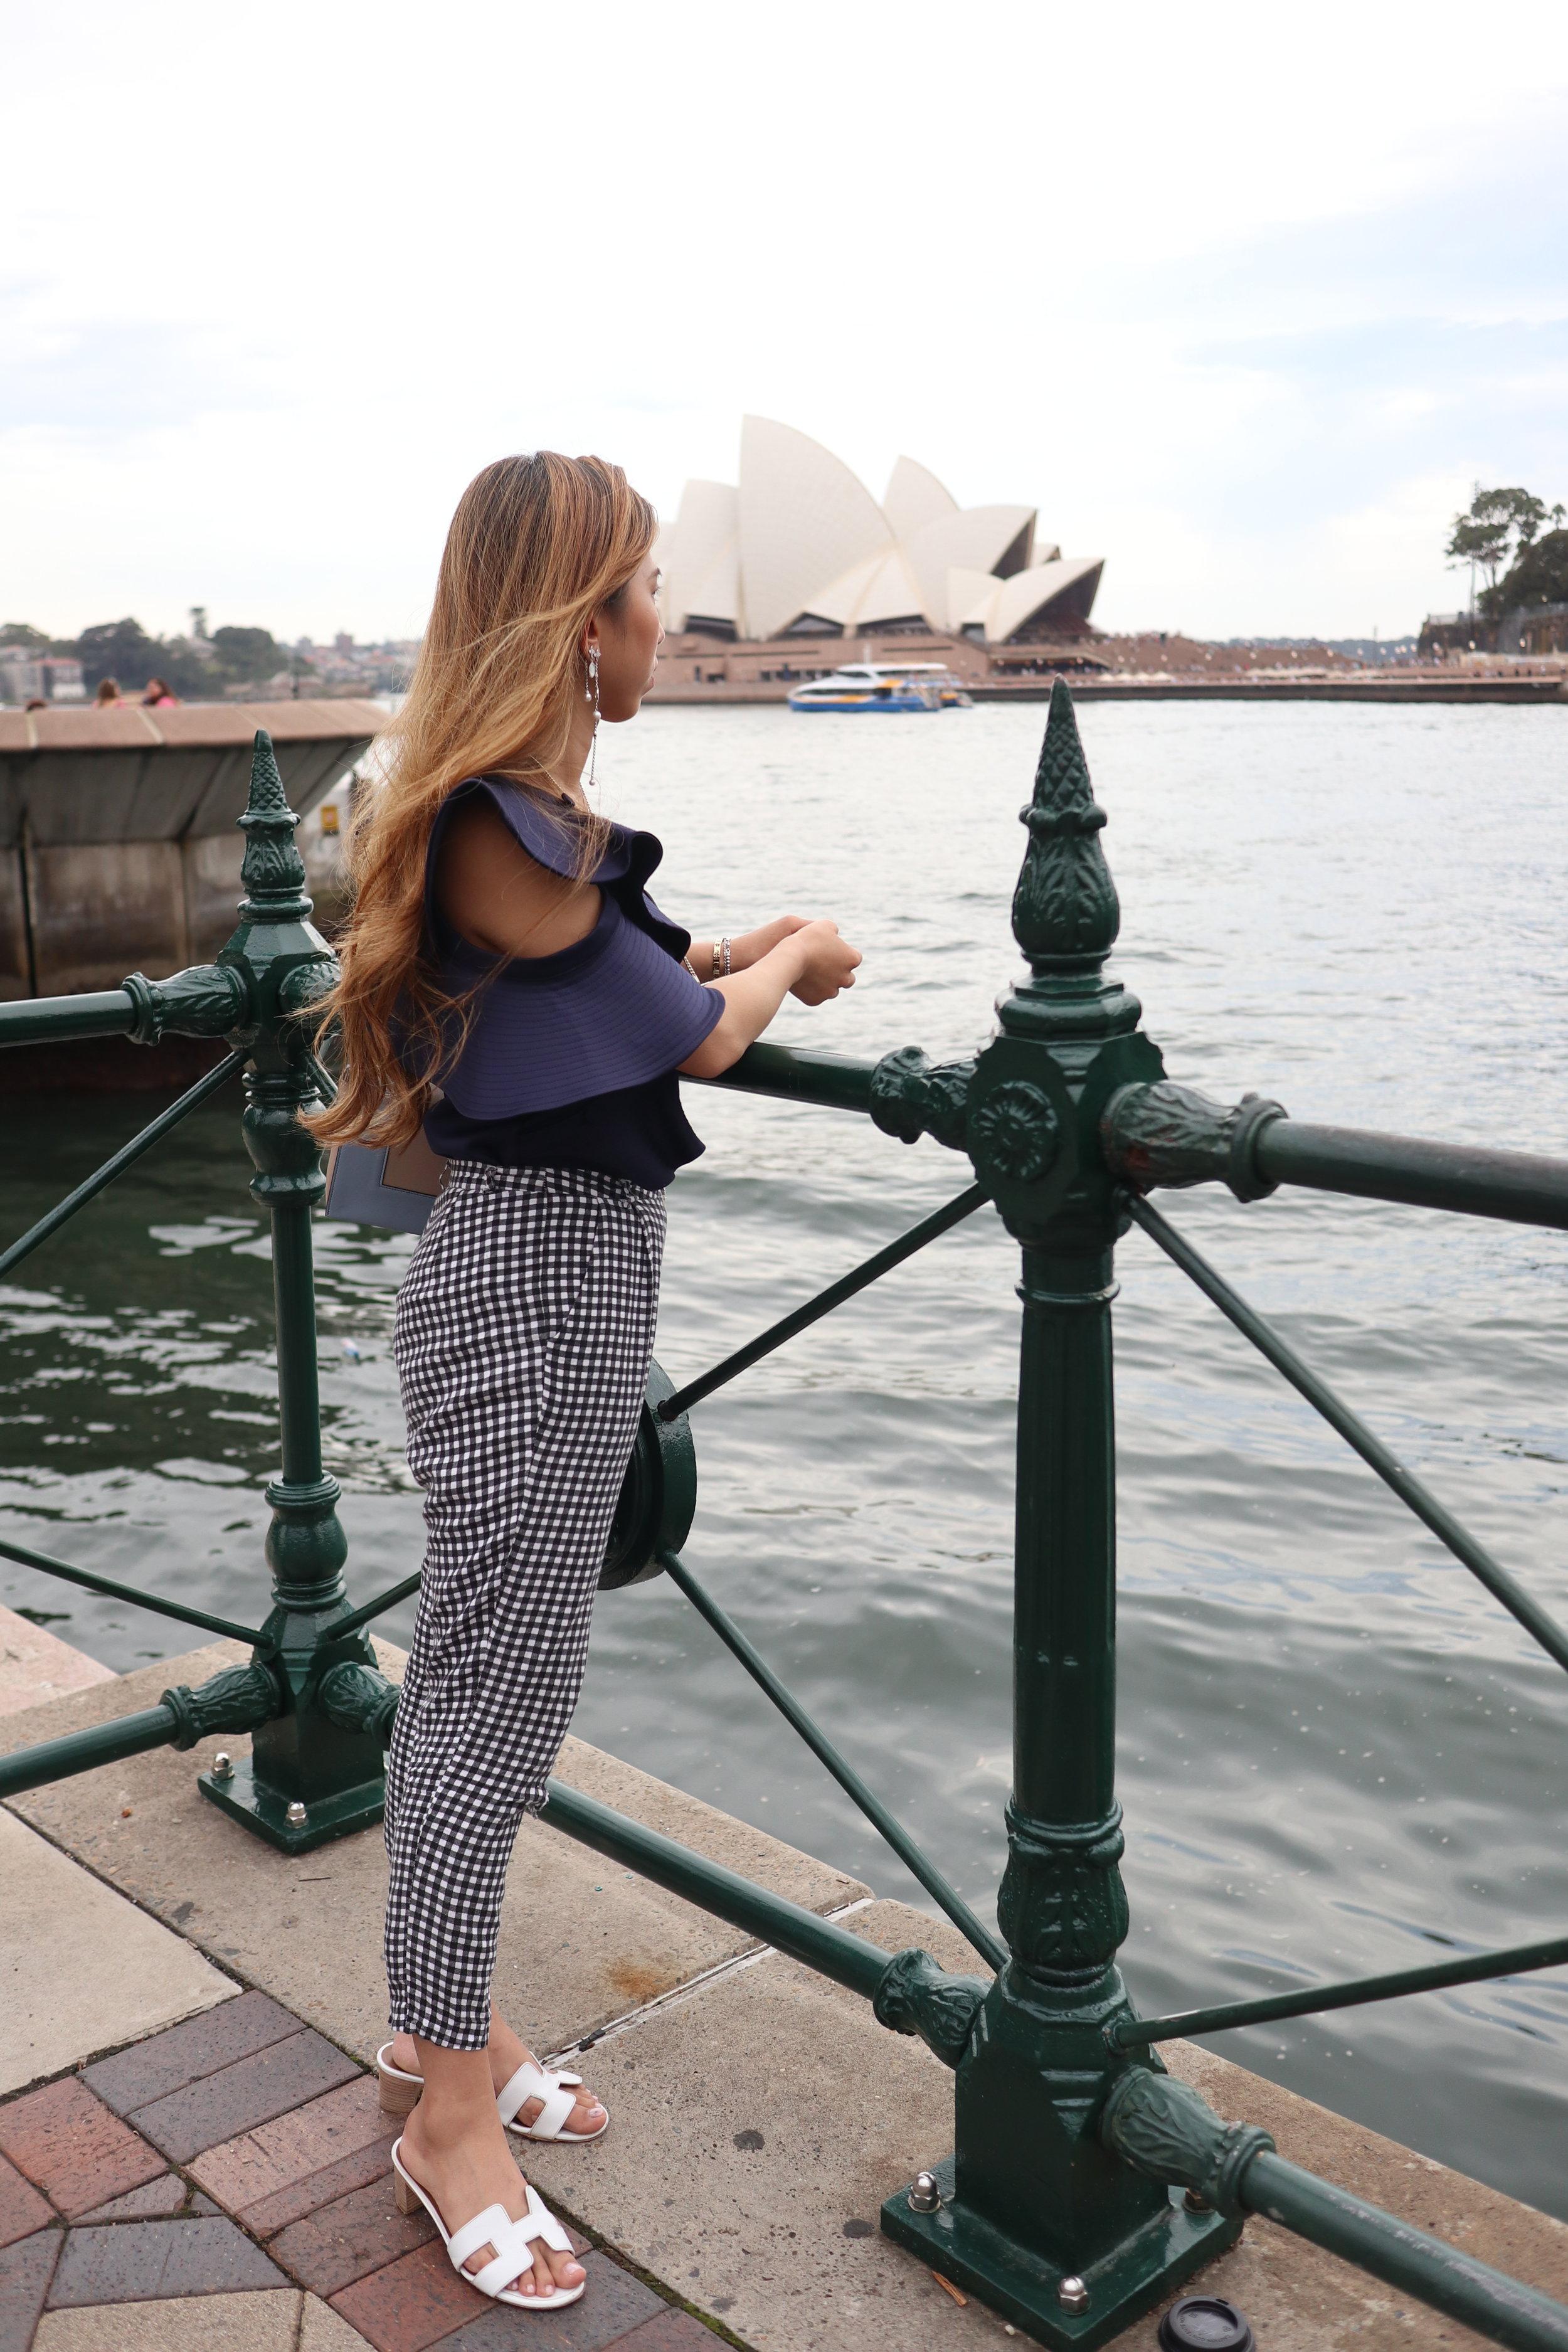 - Top: Self-Protrait one-shoulder ruffled duchess-satin topBottom: Fashmob gingham pantsShoes: Hermes Oasis sandalsBag: Celine Frame